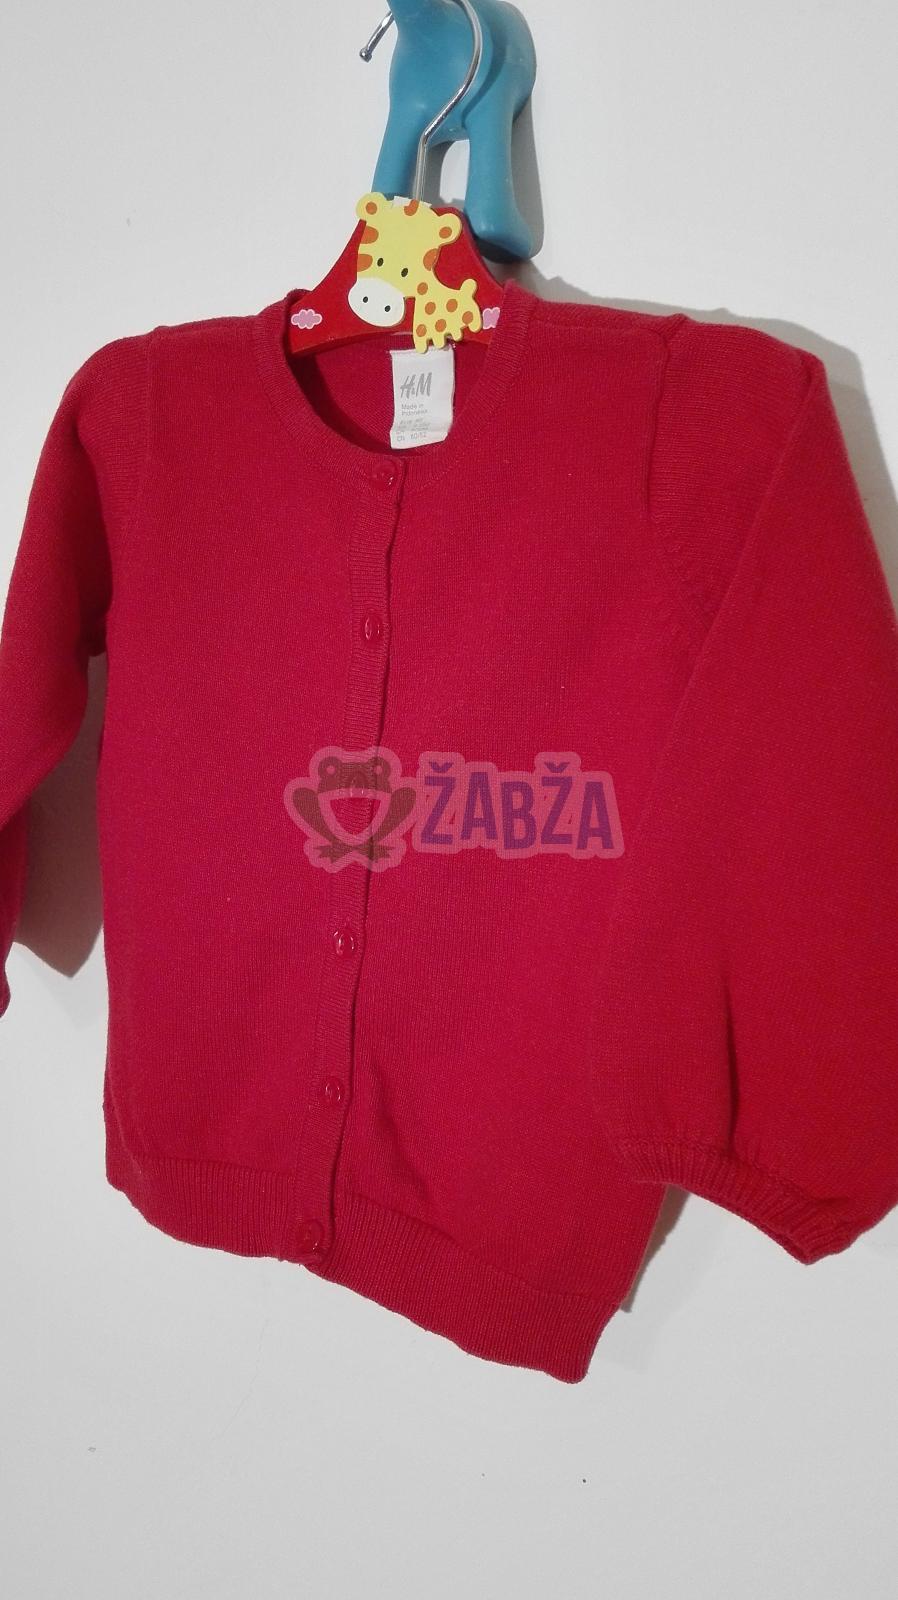 Svetr-pulovr (9-12měs.)